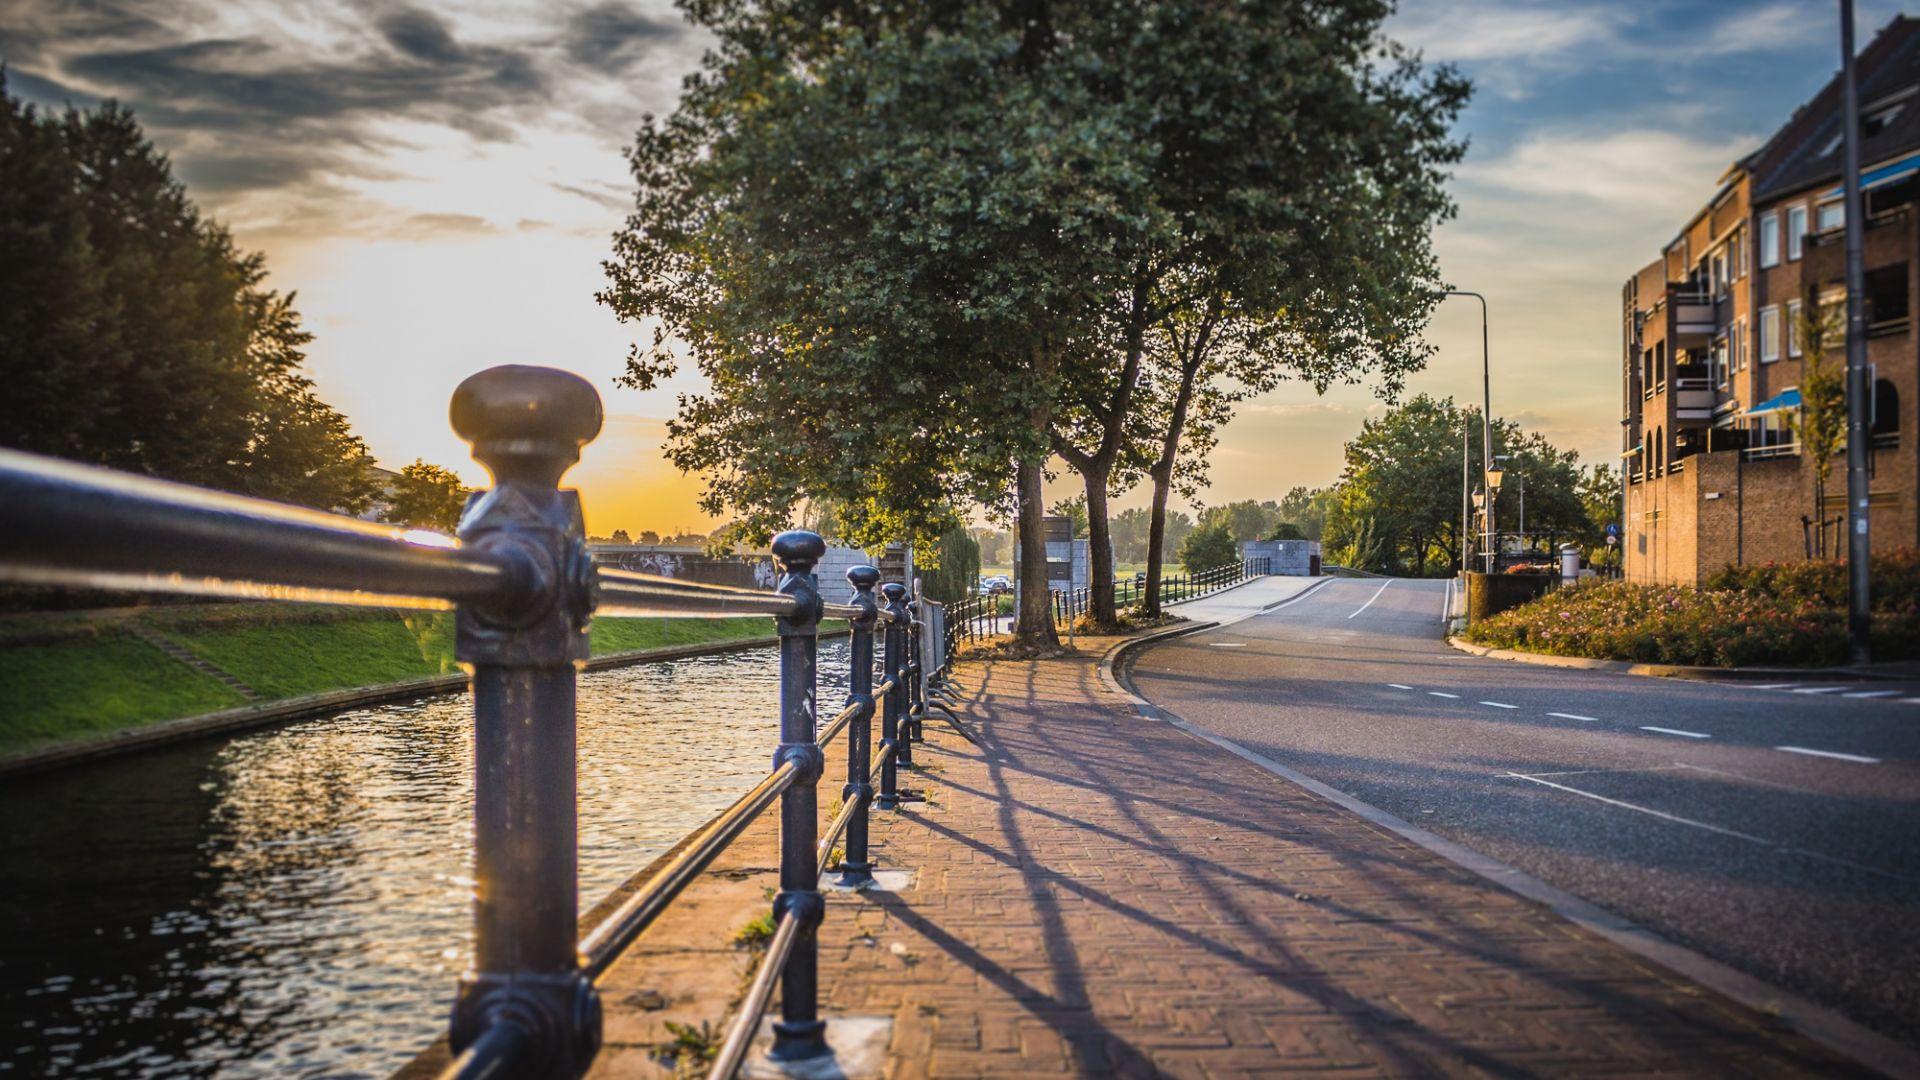 Sunset Empty Street Road Fence Trees Wallpaper